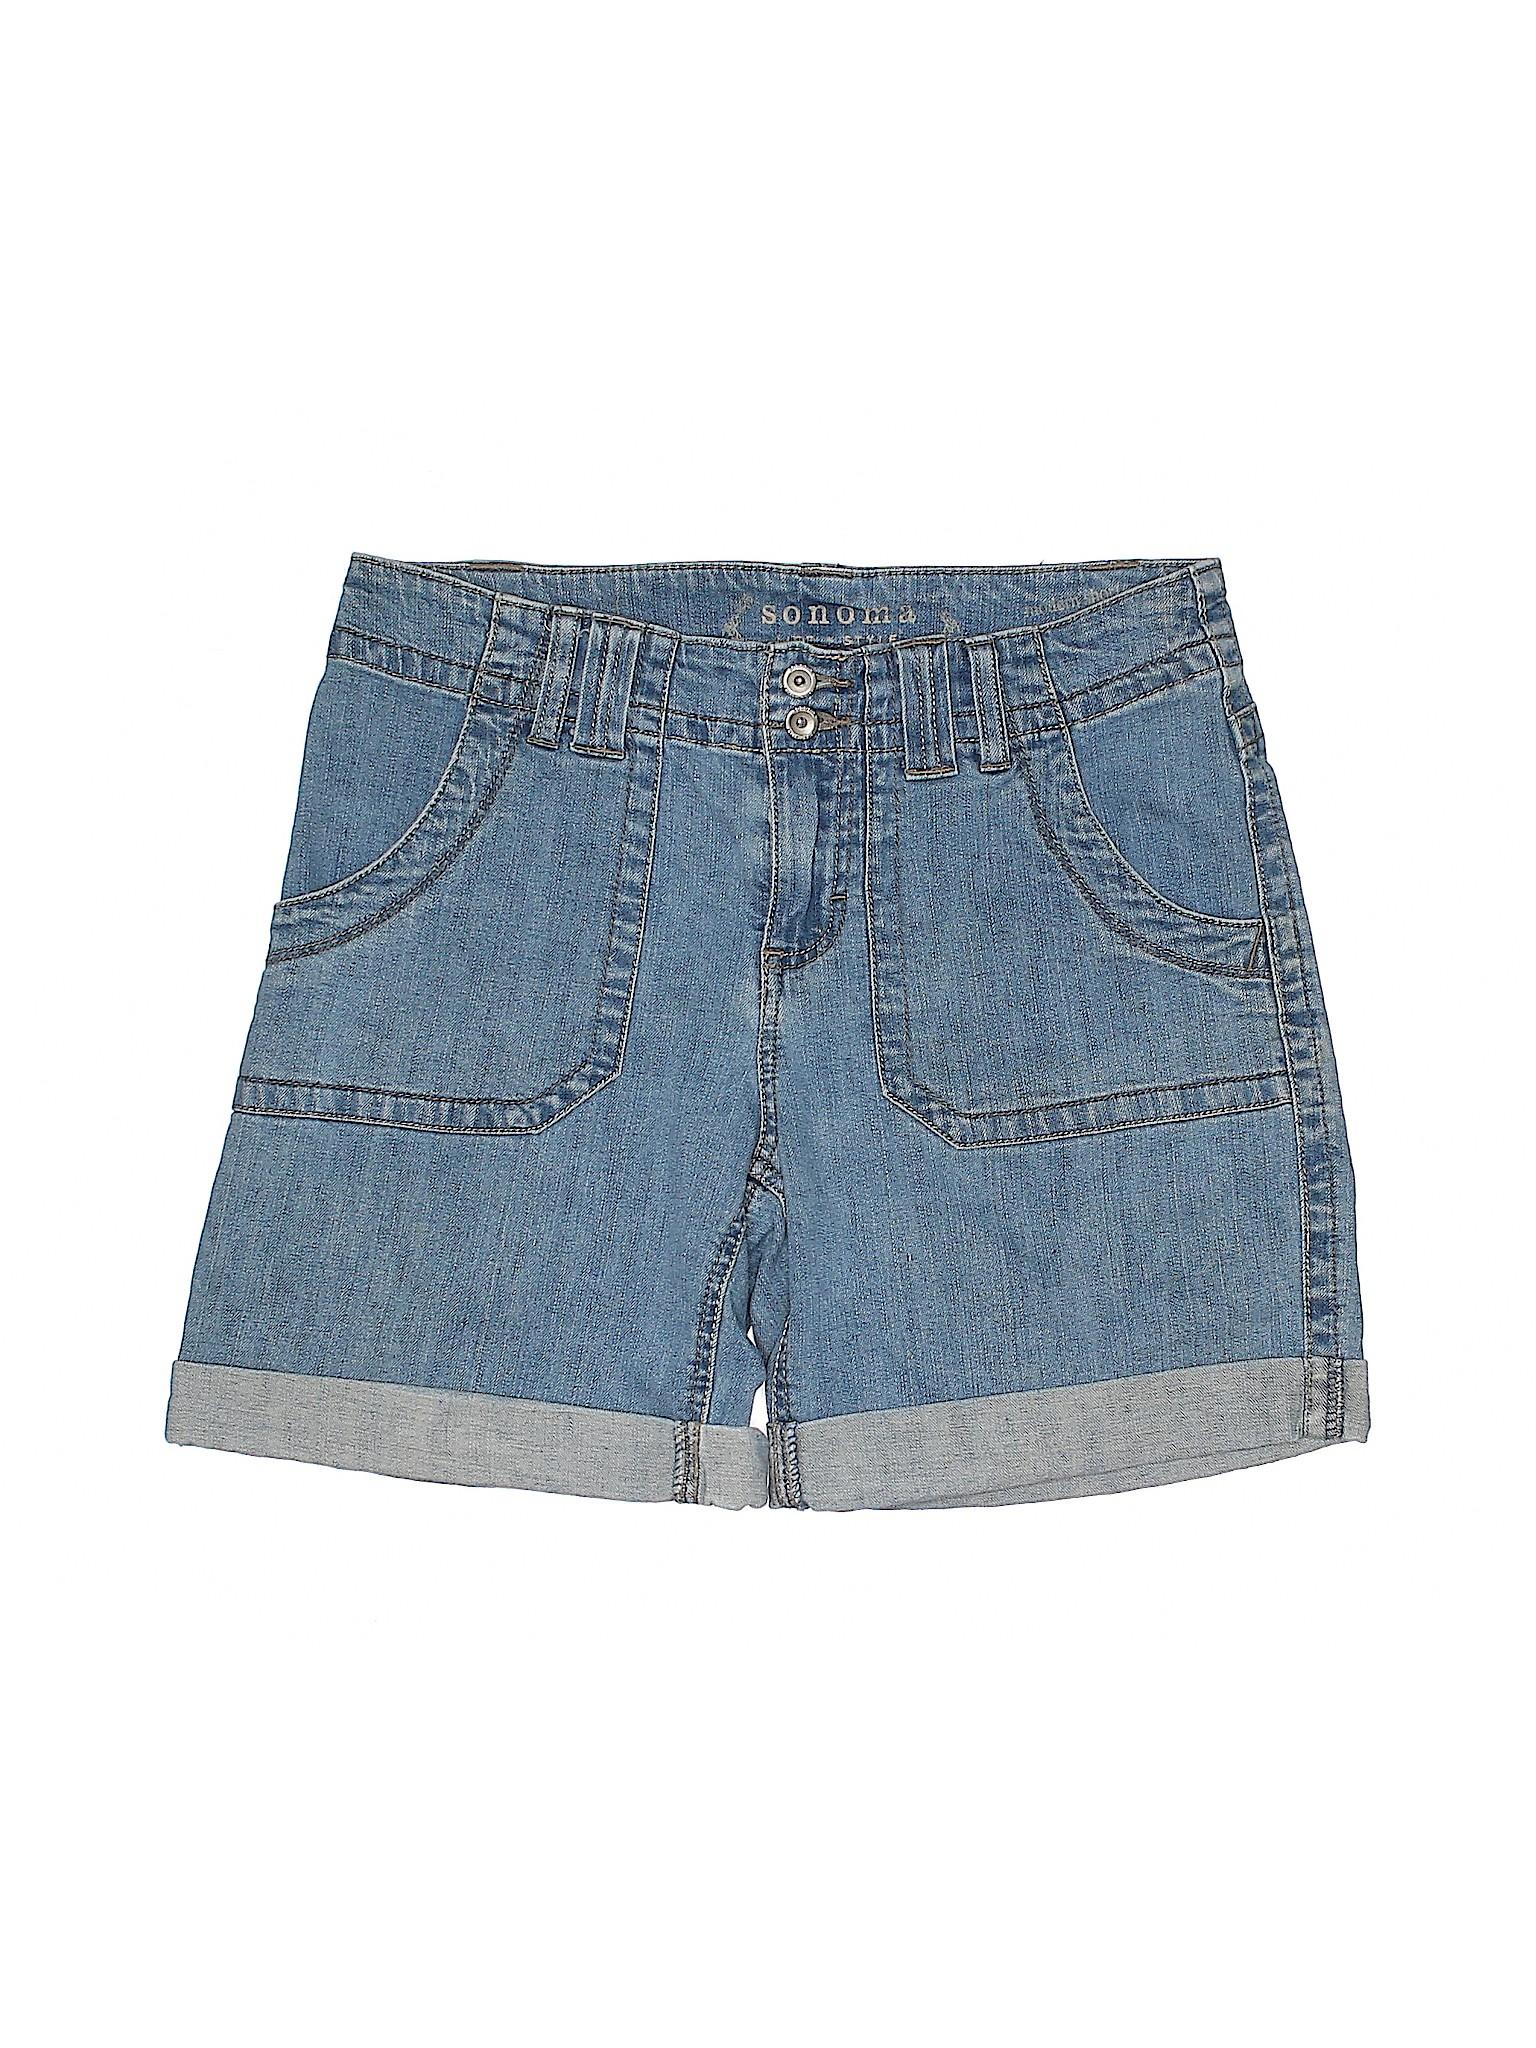 life Shorts Boutique style SONOMA Denim zPFTxX0